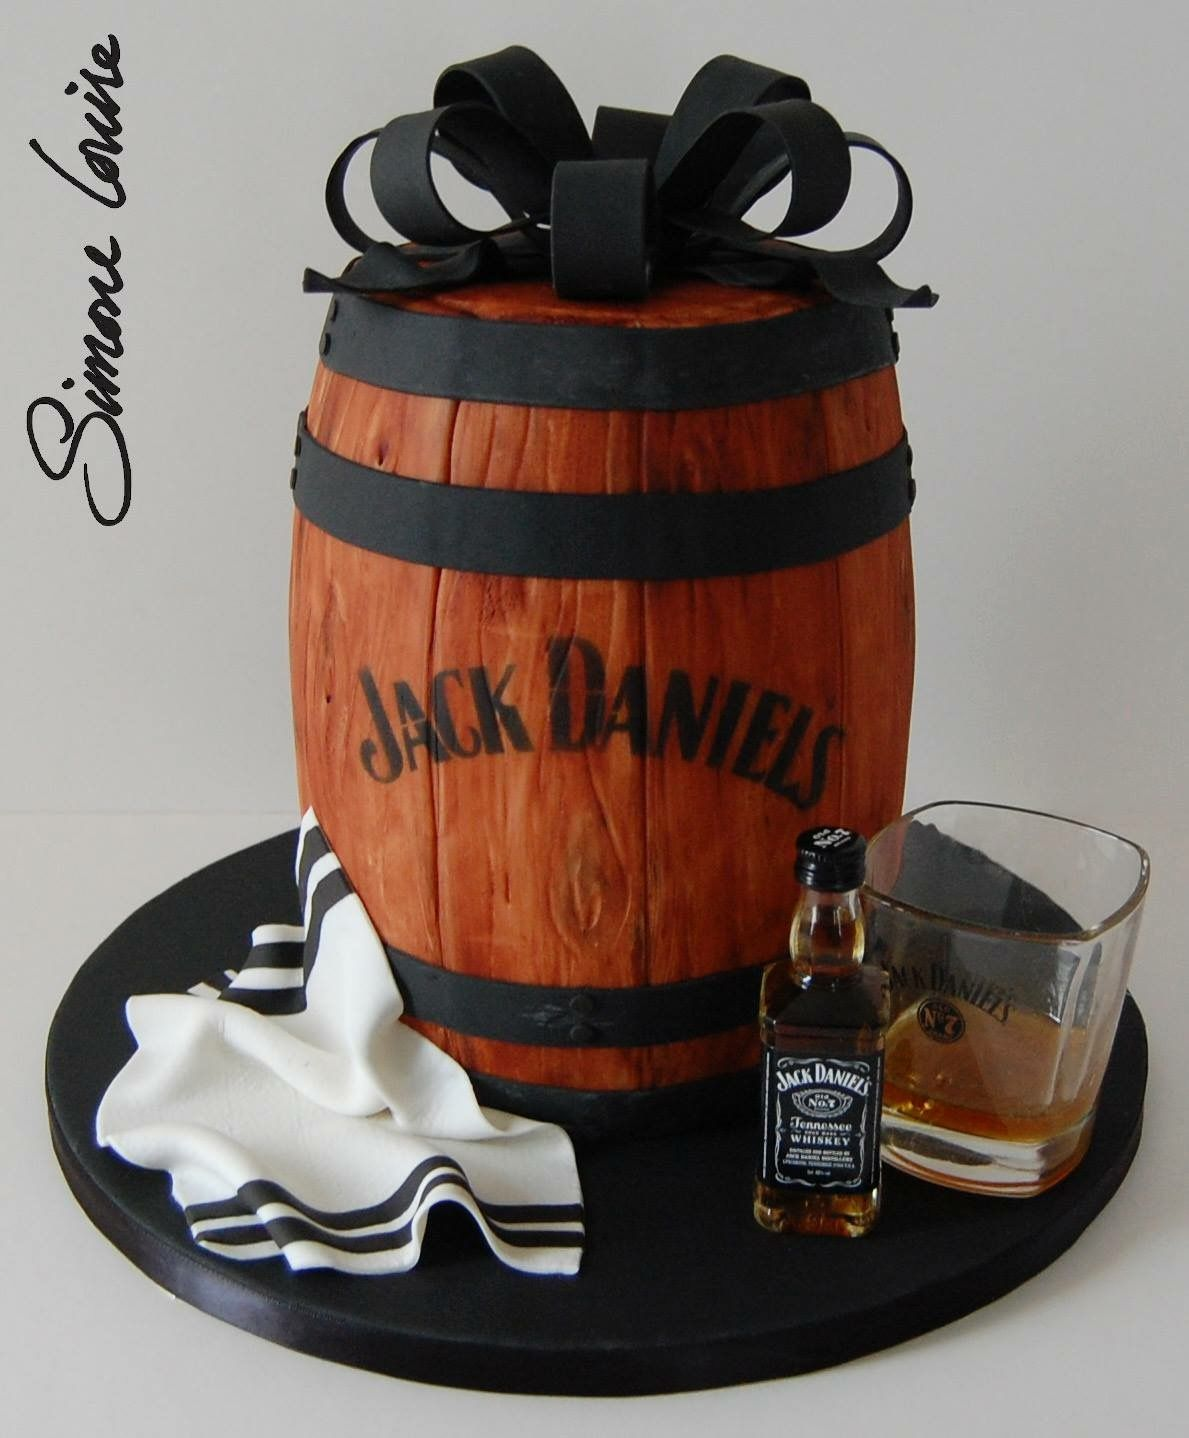 Jack Daniels Barrel Cake My 40th Bday Cake Jack Daniels Cake